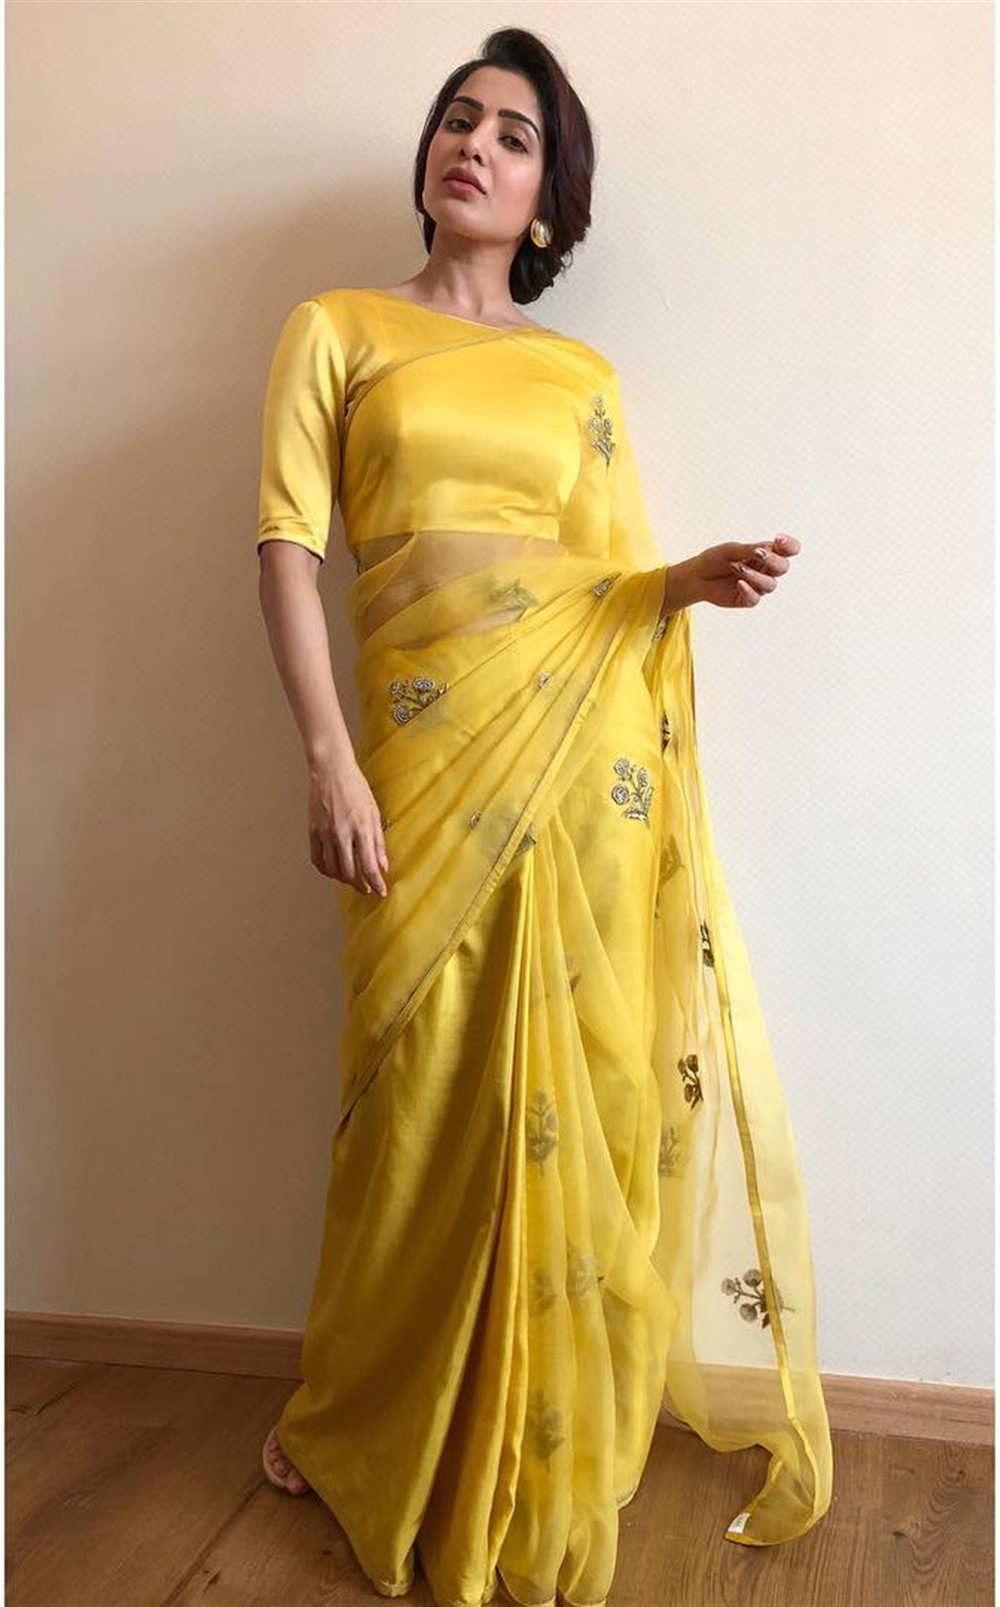 Actress Samantha Launches Big C Mobile @ Madurai Photos